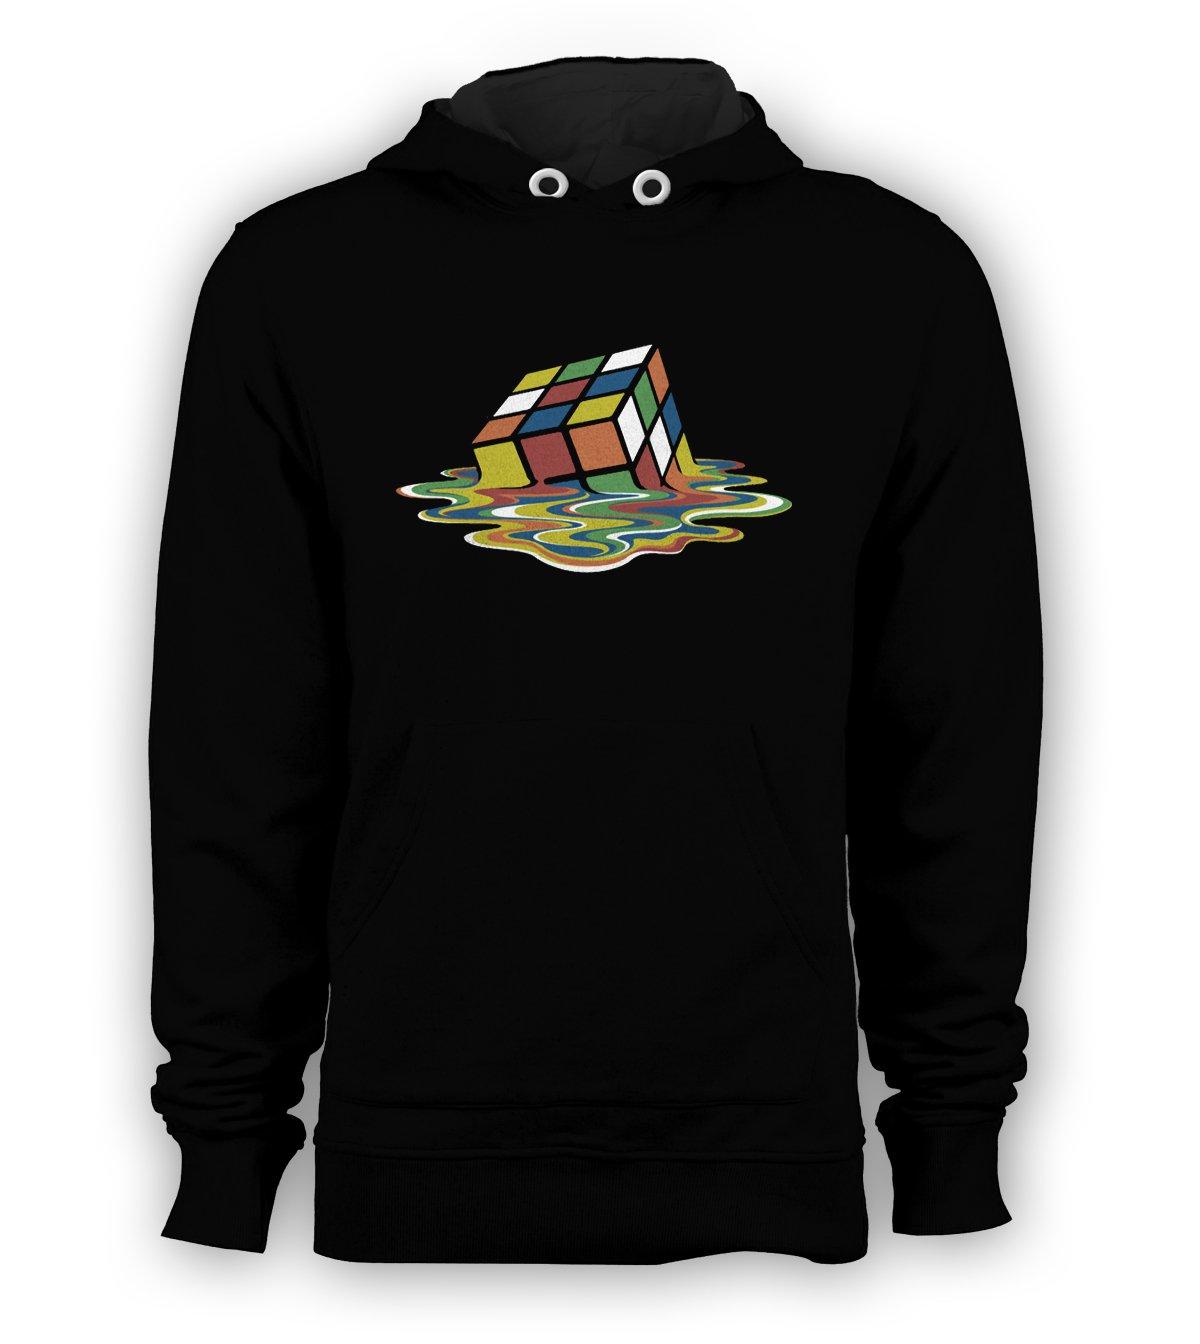 Melting Rubiks Cube Sheldon Cooper Big Bang Theory Pullover Hoodie Men Sweatshirts Size S to 3XL